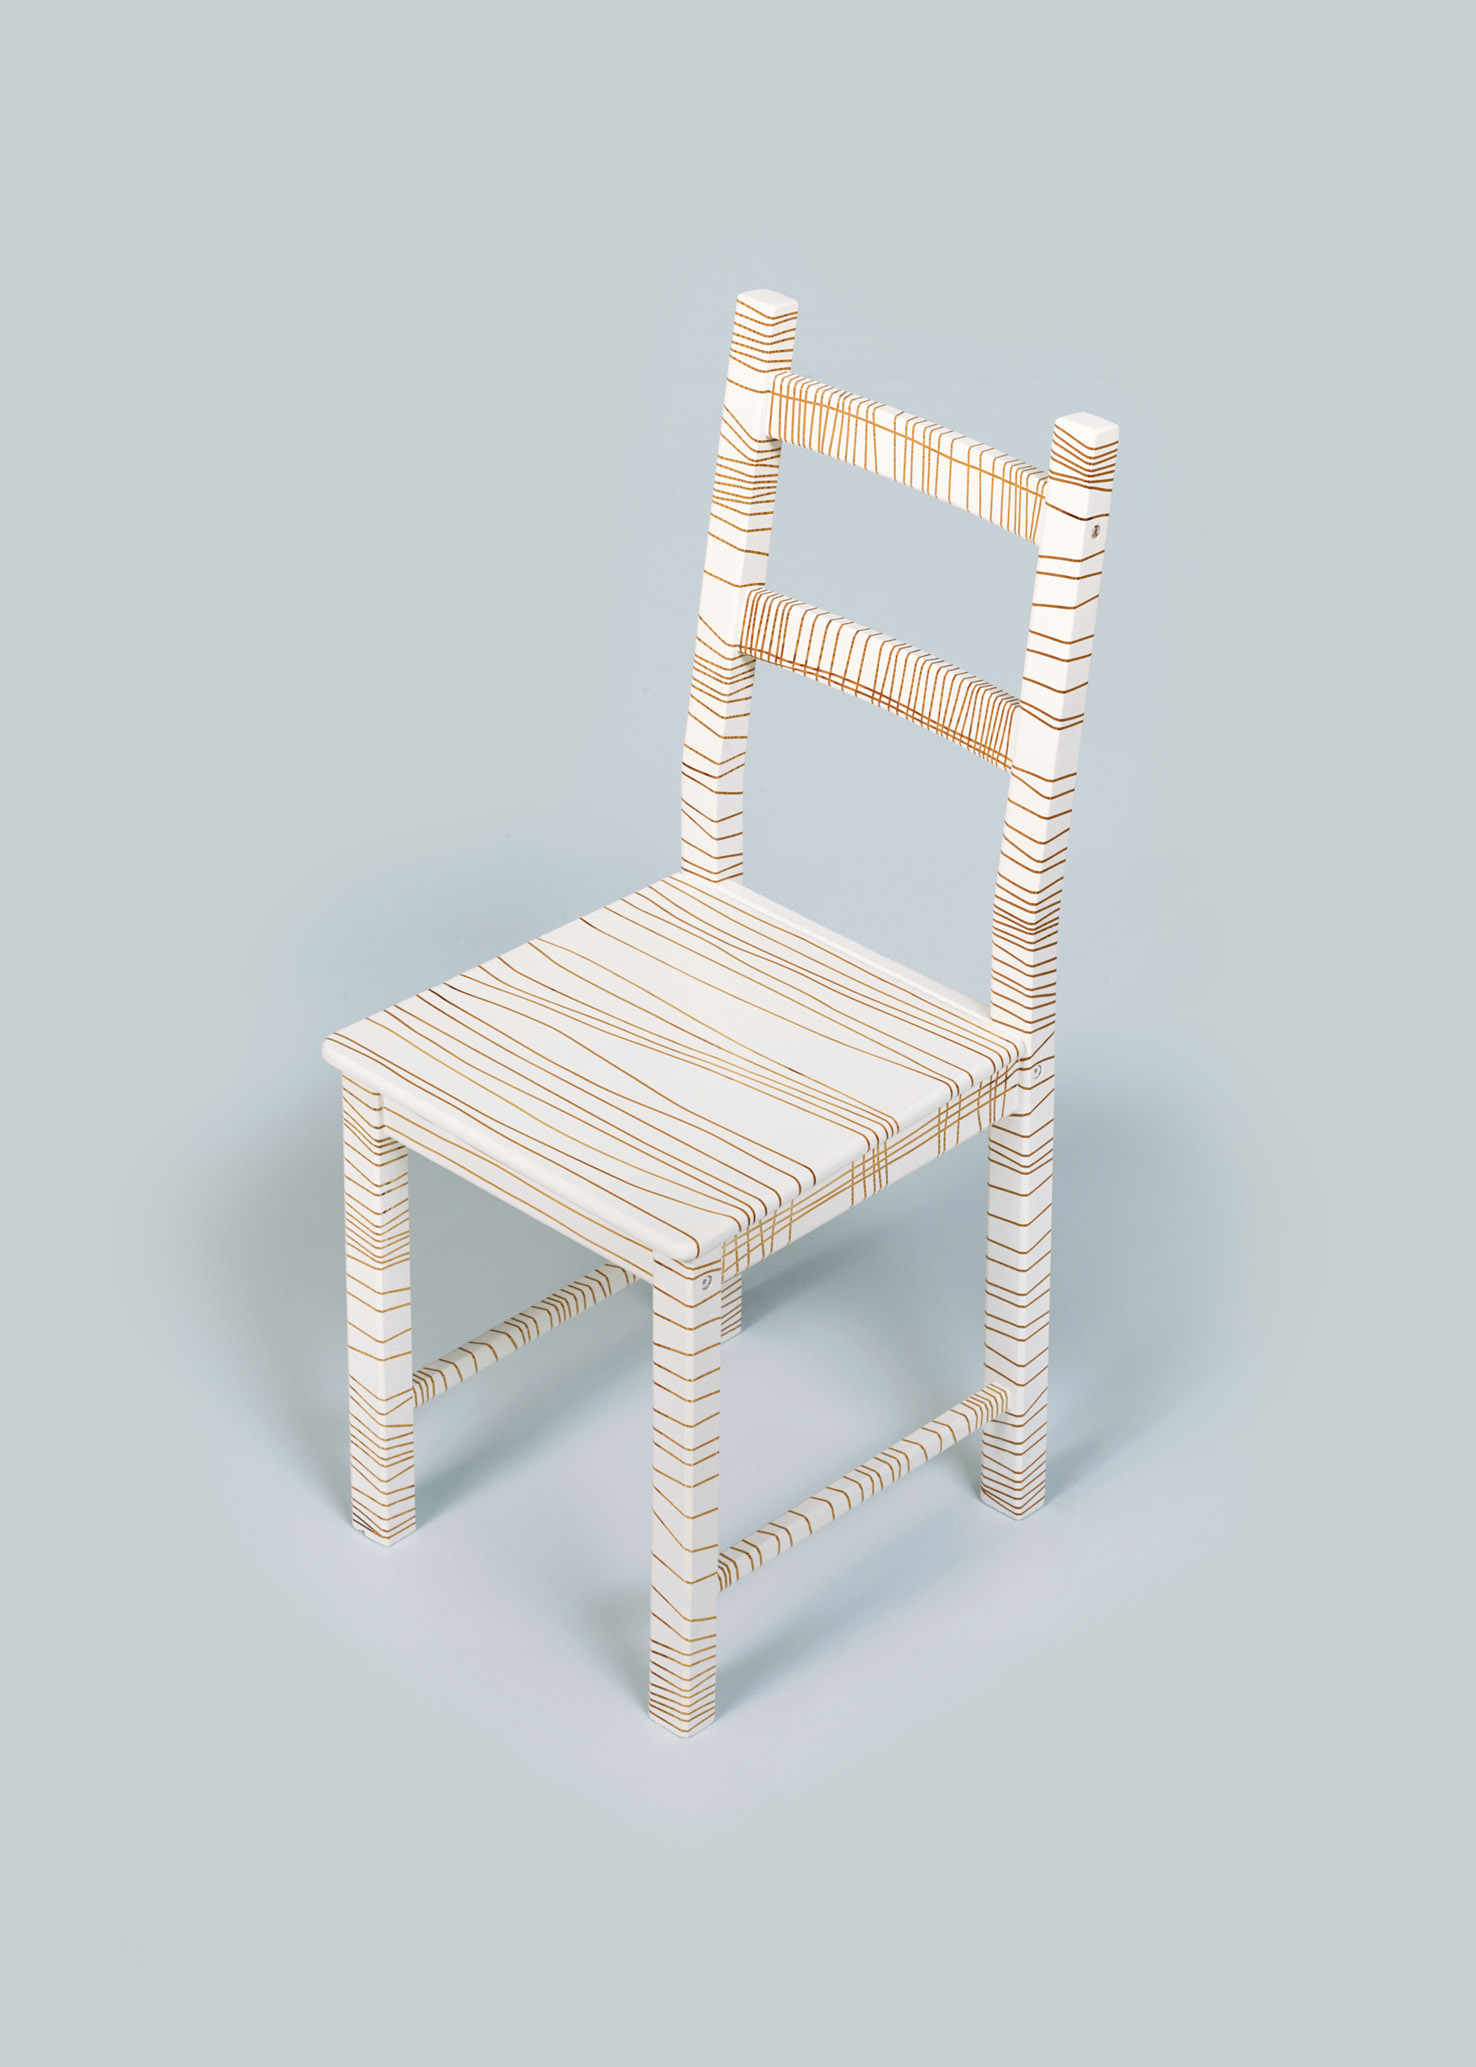 New Old Chair Studio Simone Post